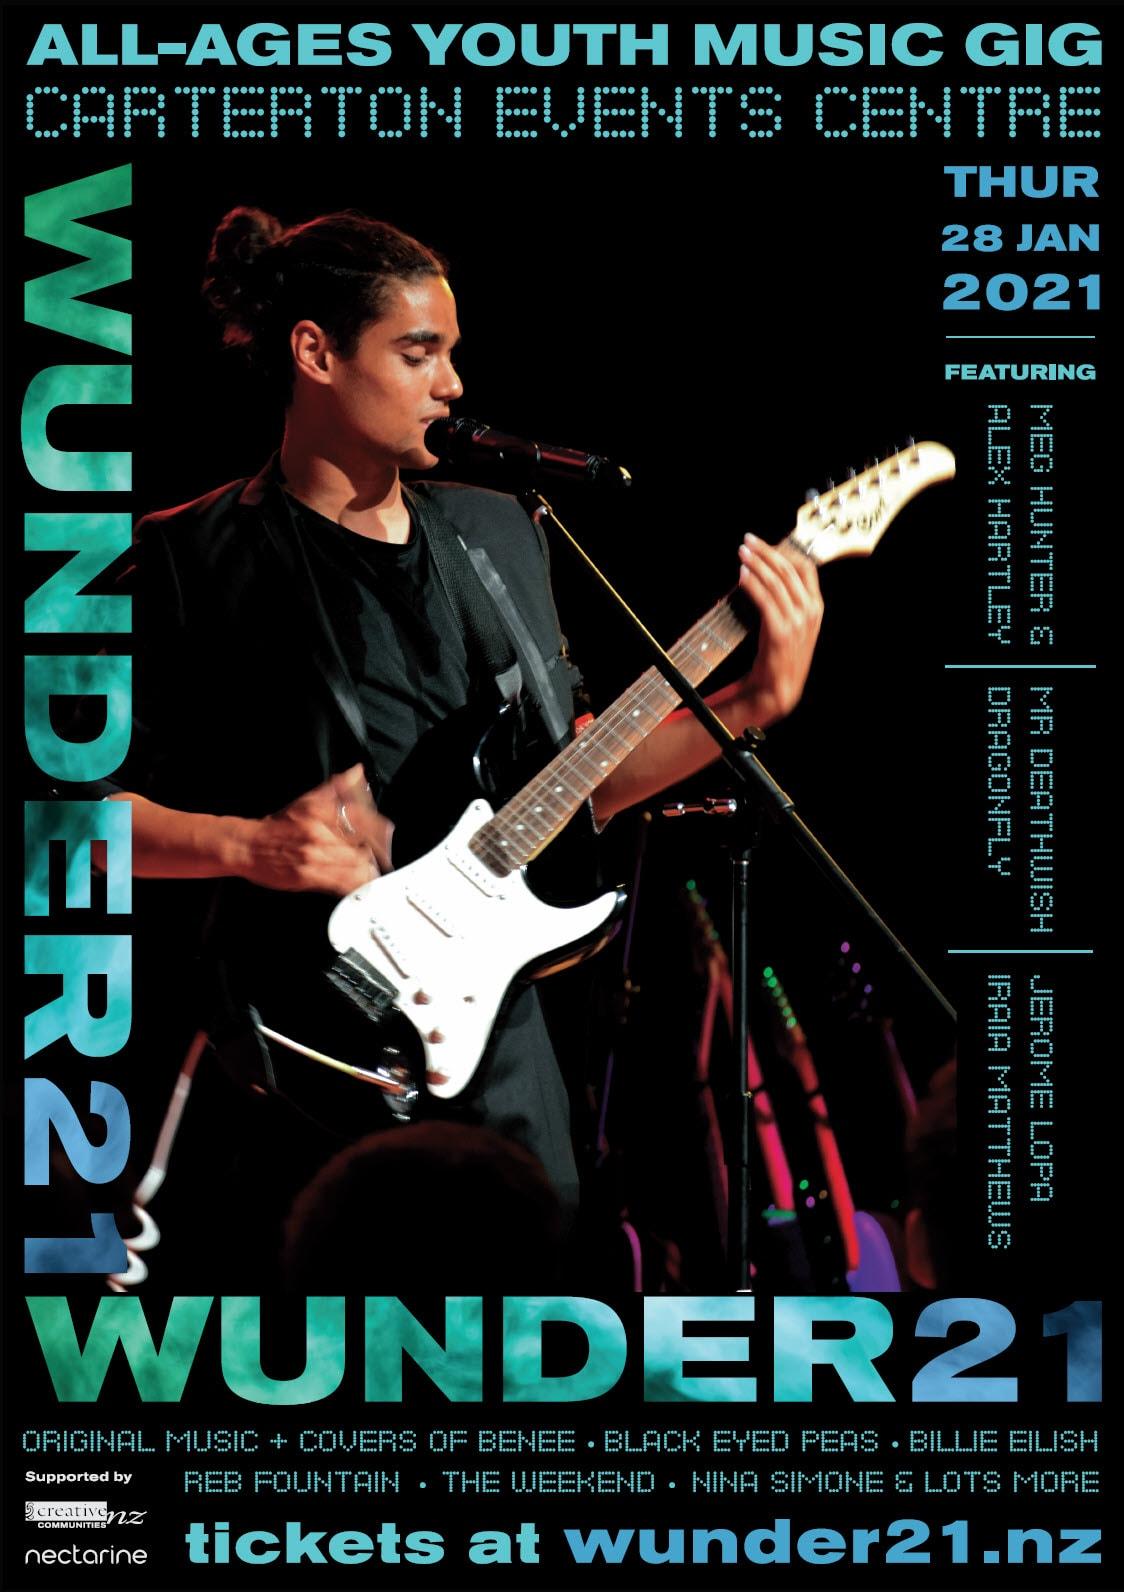 Wunder21 Poster Alex Nectarine Portfolio